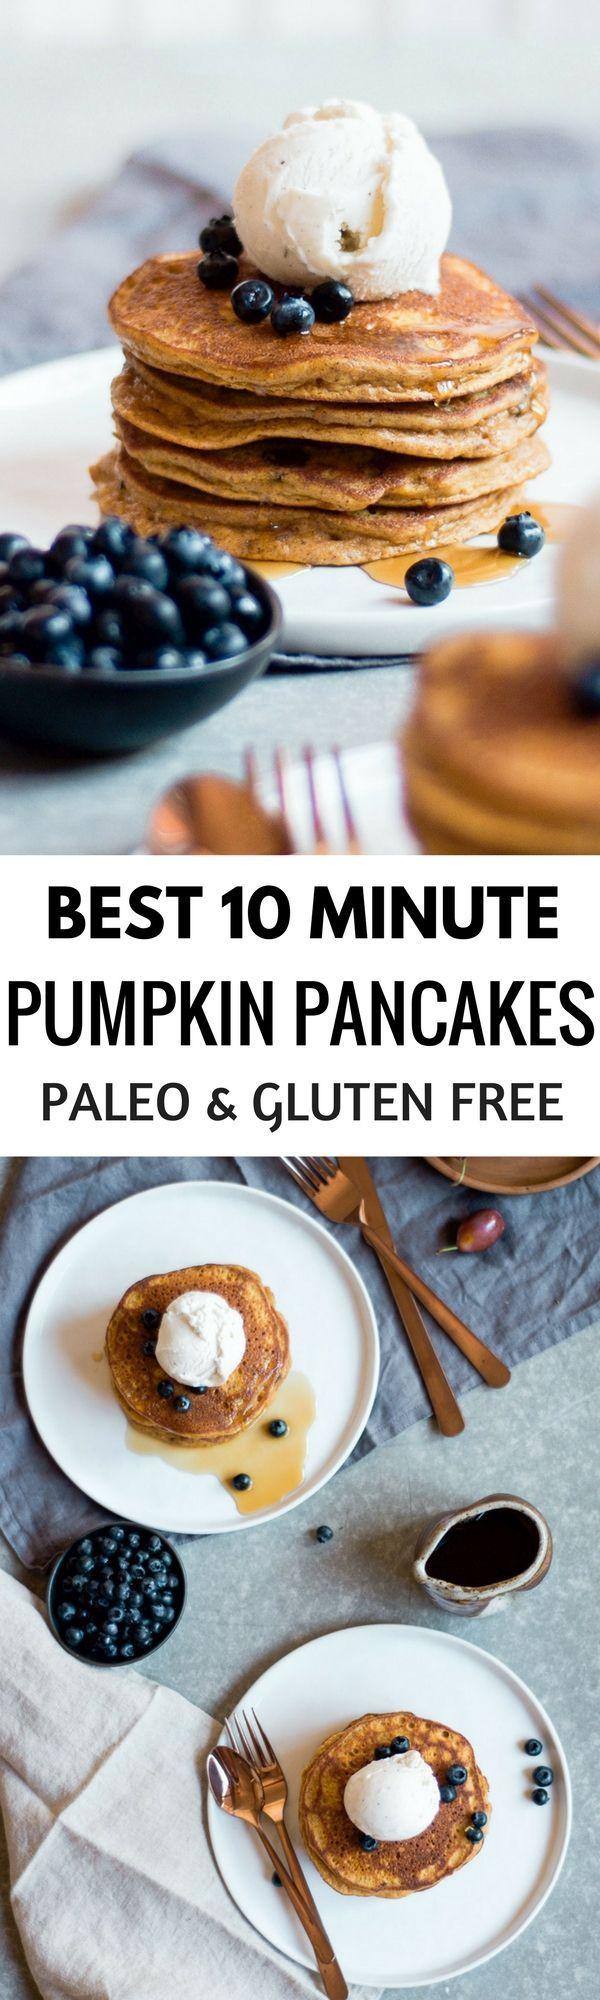 Best Paleo Pumpkin Pancakes Made In Only 10 Minutes! Easy Healthy Breakfast Recipe. Best Gluten Free Pumpkin Recipes. Beautiful Food Photography.